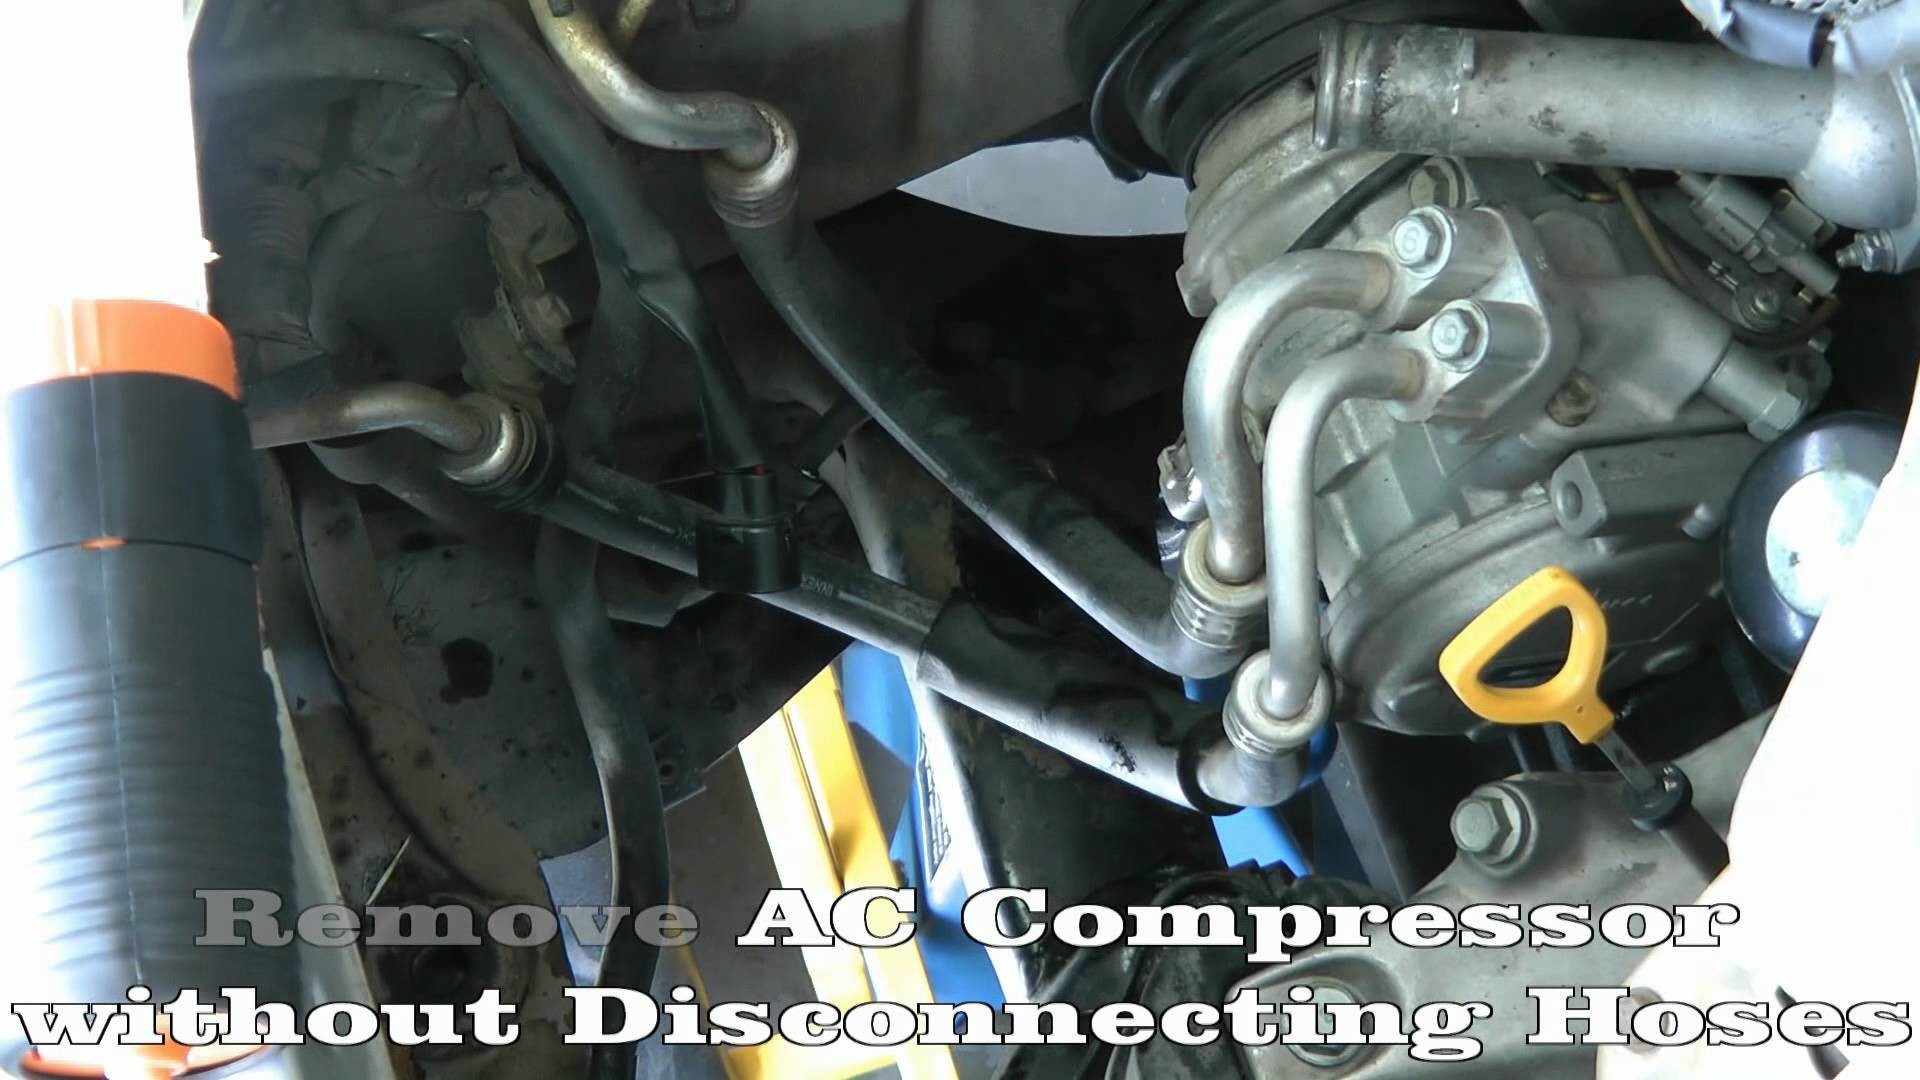 1997 toyota Camry Engine Diagram Part 1 Of 10 Remove Engine & Tranny Rebuild 1994 toyota Camry Of 1997 toyota Camry Engine Diagram